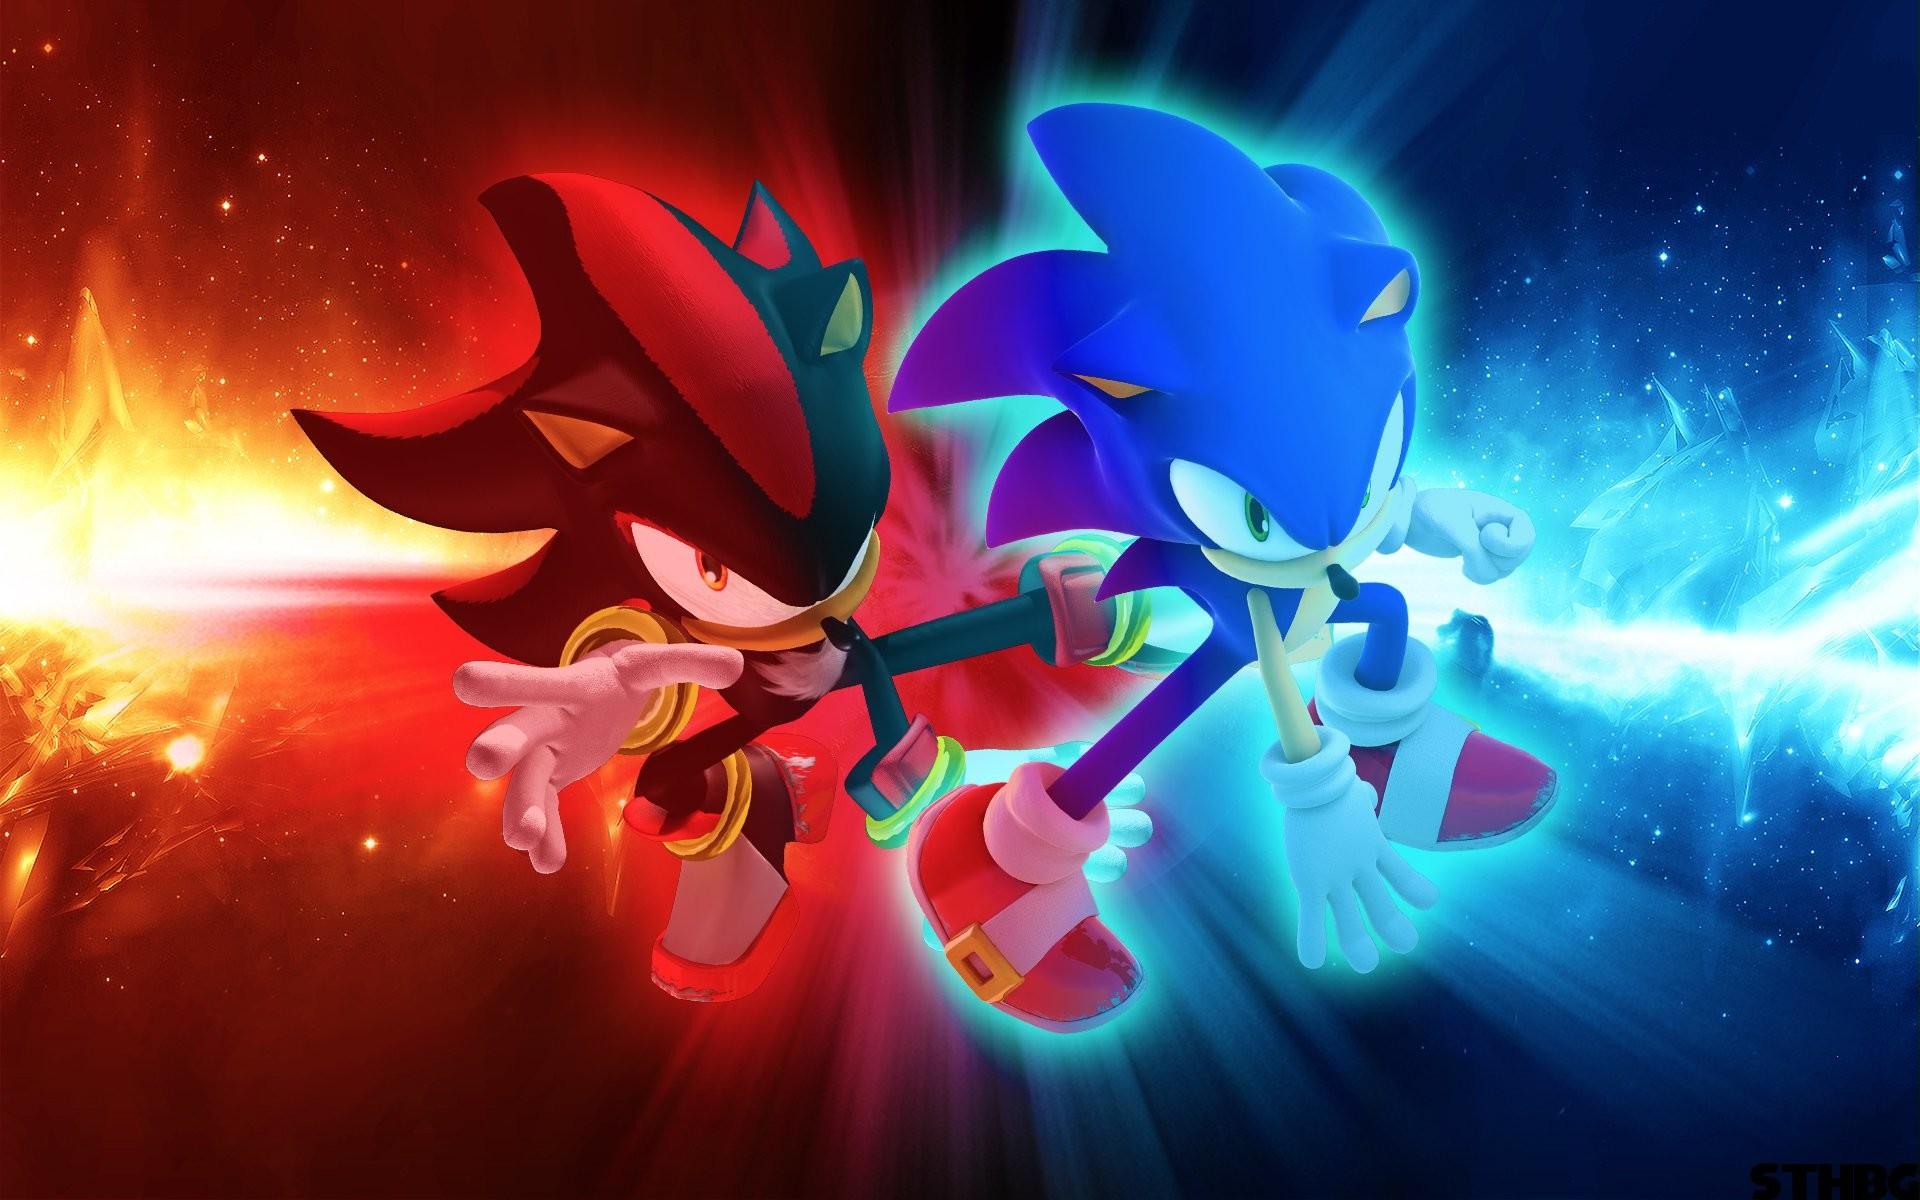 Sonic Adventure 2 Wallpaper (73+ images)